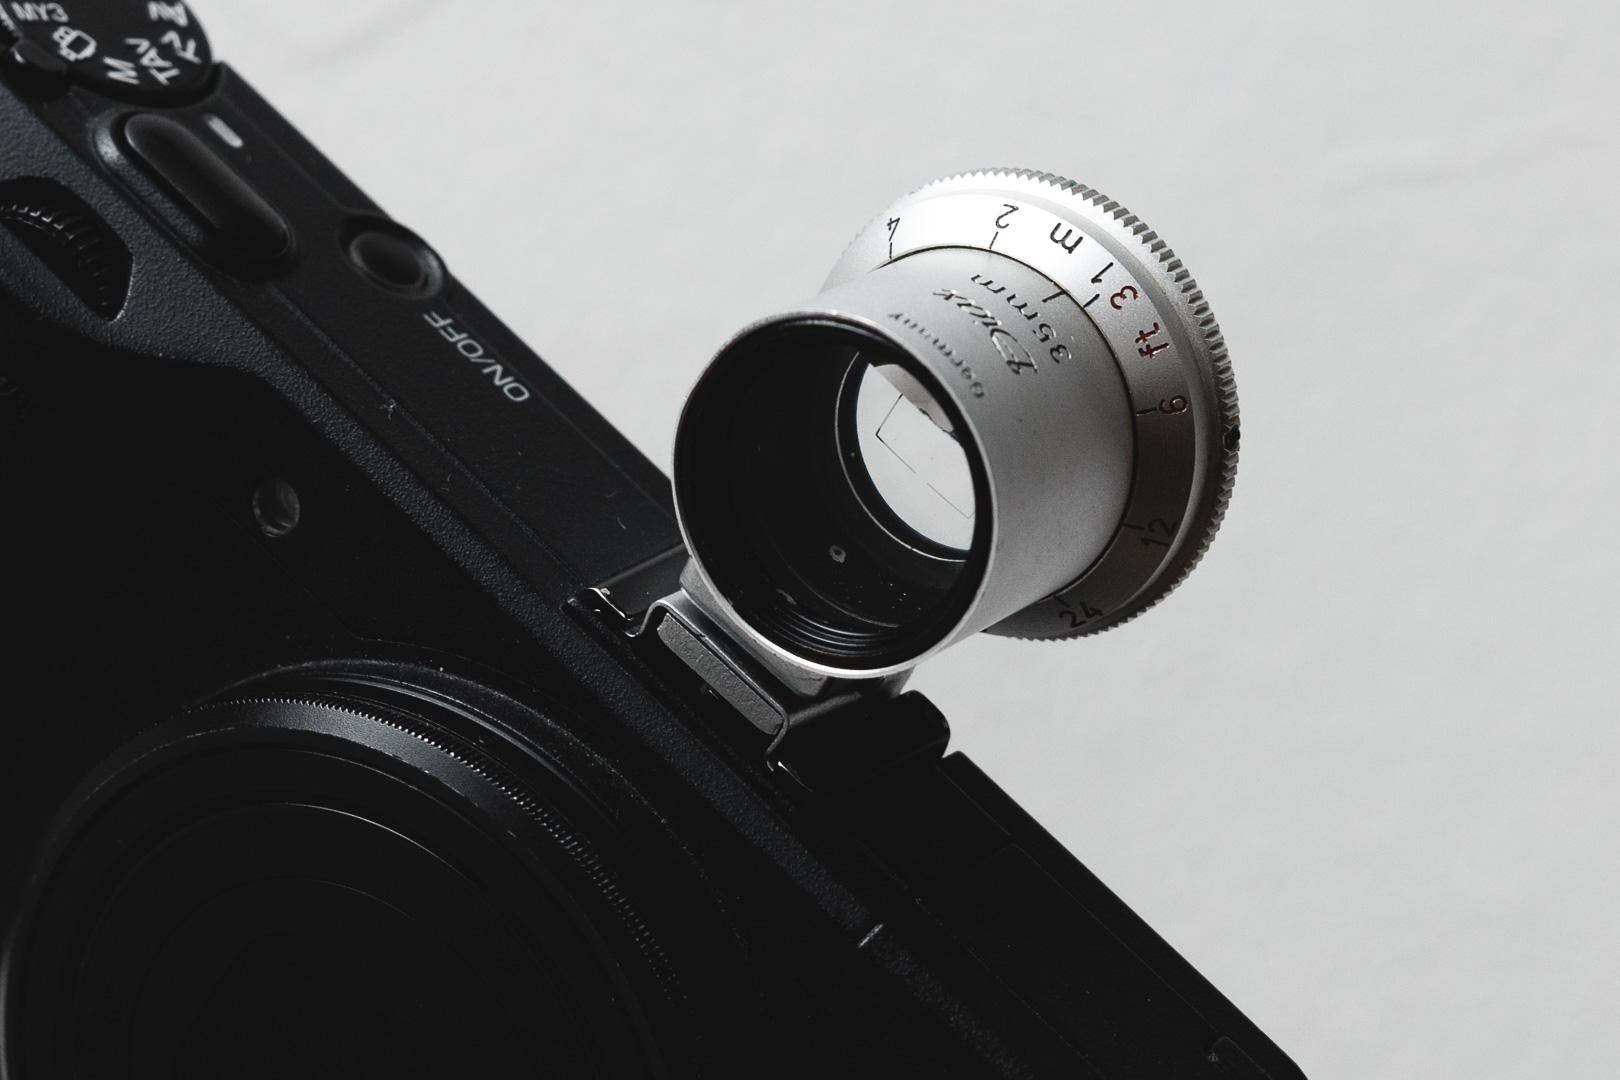 Diax-35mm-finder-Ant Tran-20170402-2979.jpg